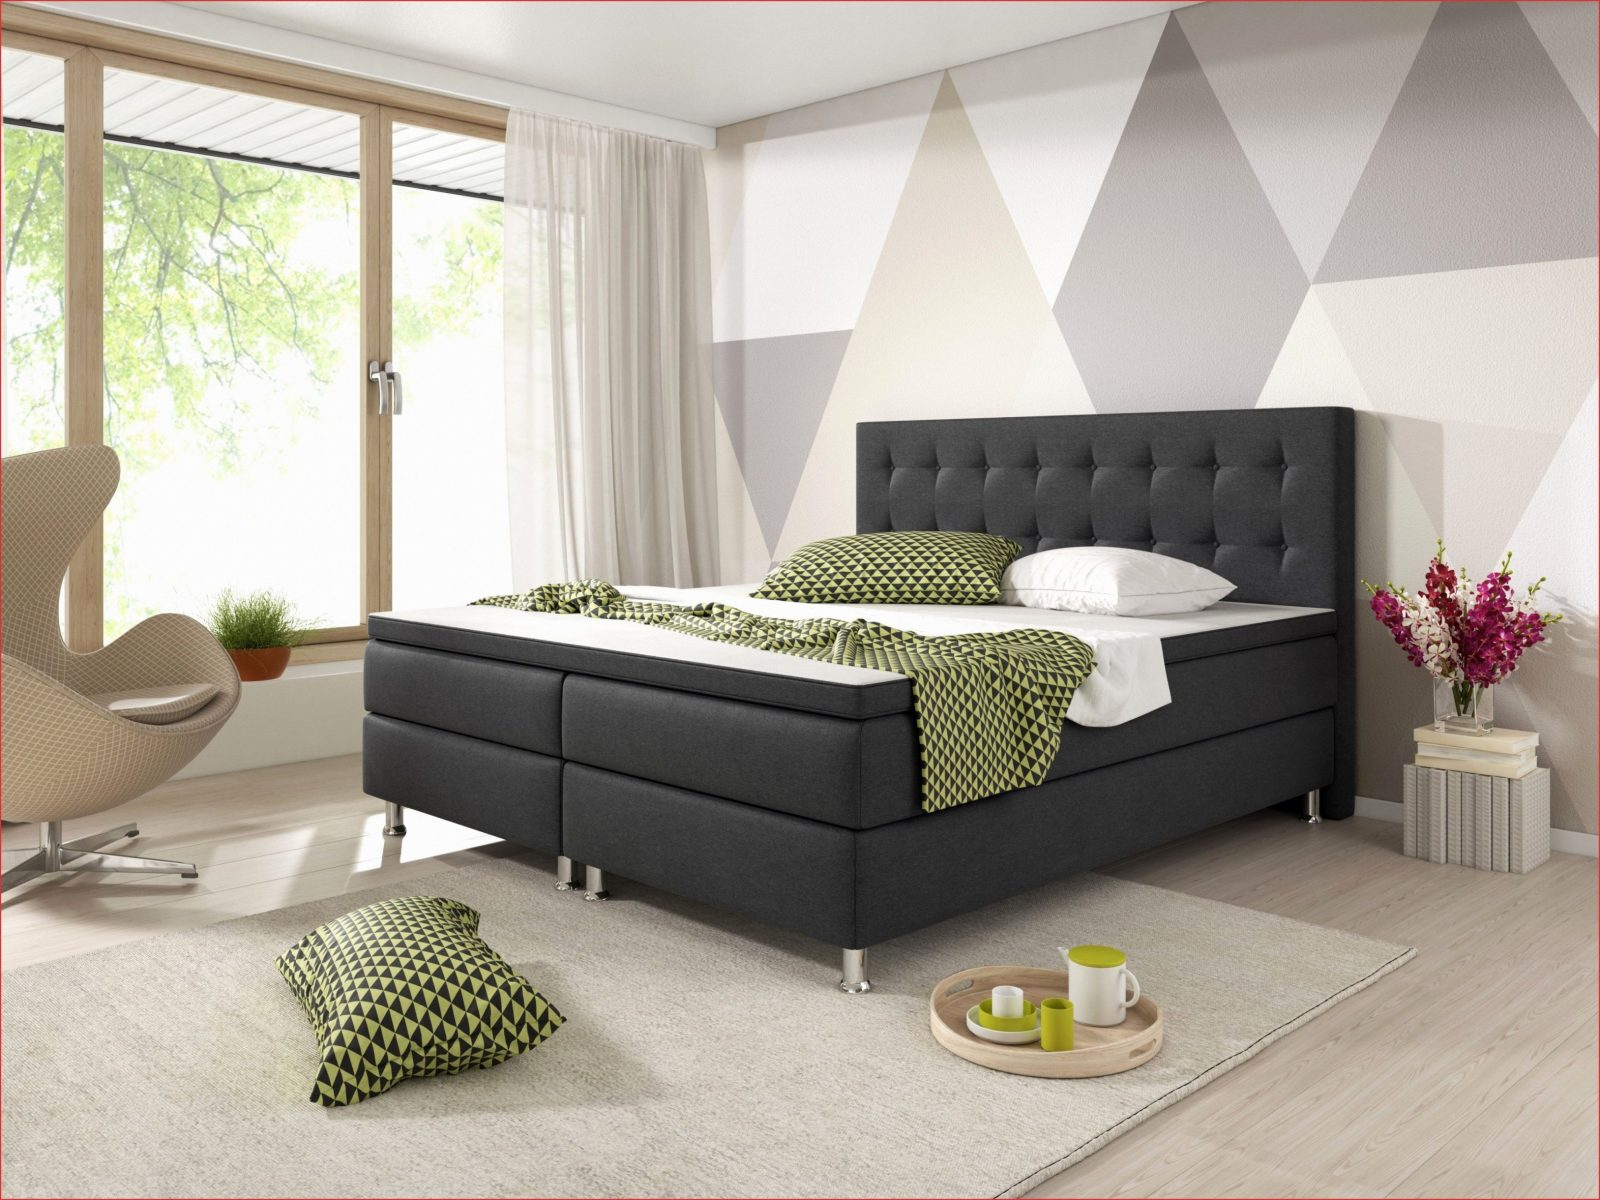 Bett Günstig Kaufen Neu Schlafzimmer Komplett Günstig Mit von Bett Komplett Günstig Kaufen Photo